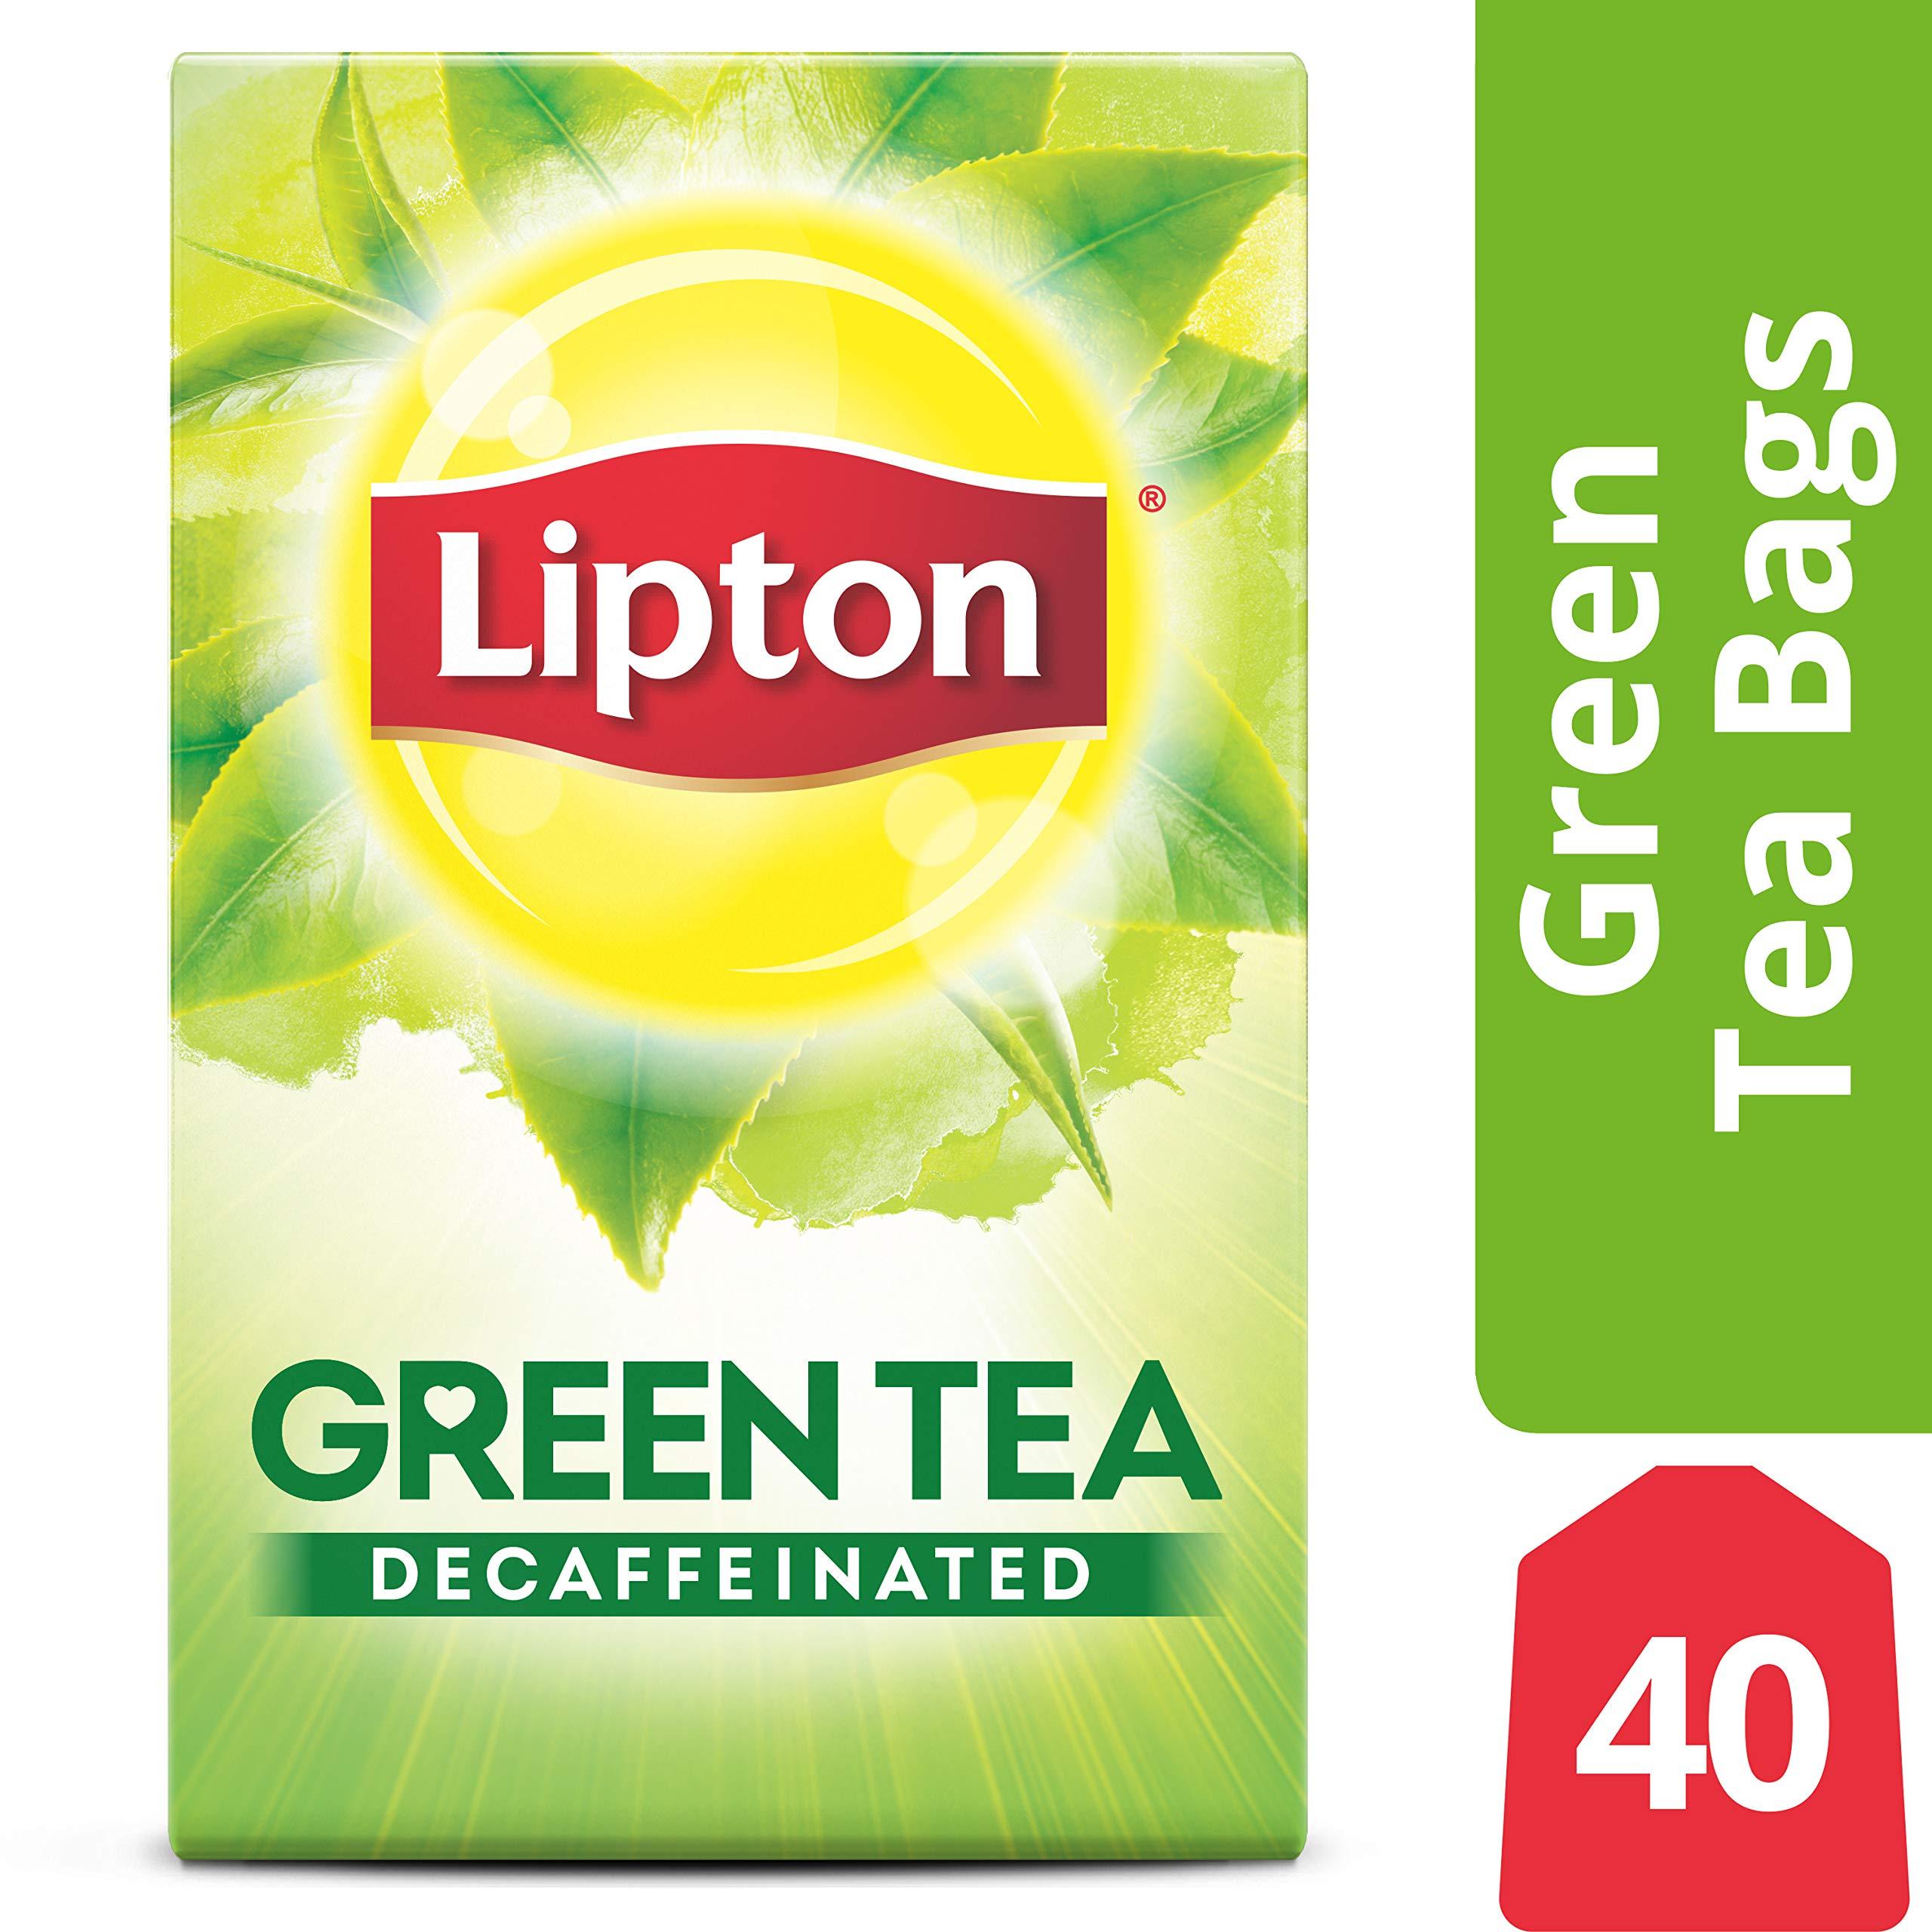 Lipton Green Tea Bags, Decaffeinated, 40 ct (pack of 6)